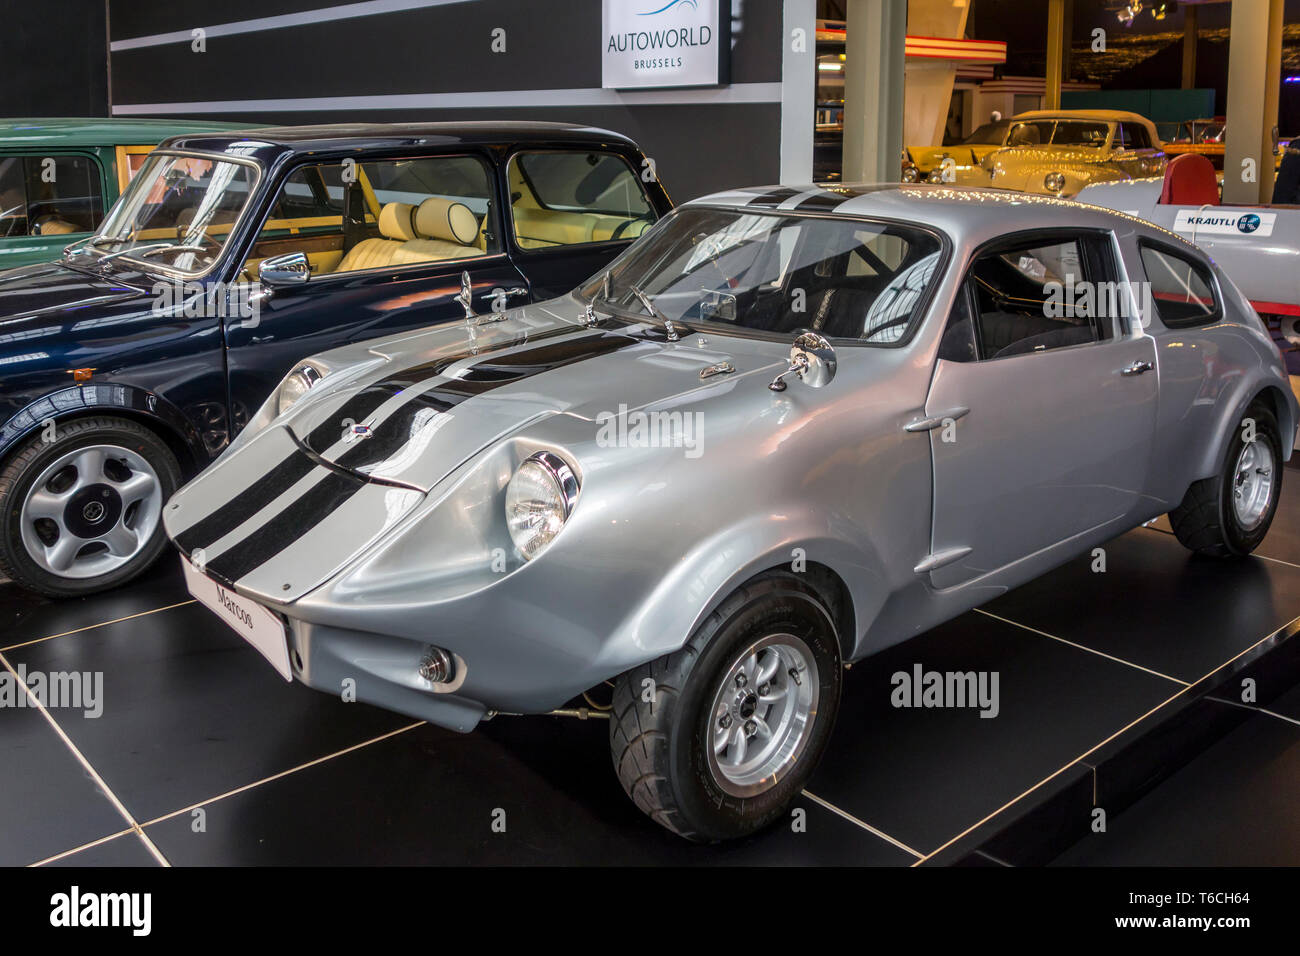 1974 Mini Marcos Mark IV / MK4, British classic 2-door coupé sports car at Autoworld, vintage car museum in Brussels, Belgium Stock Photo